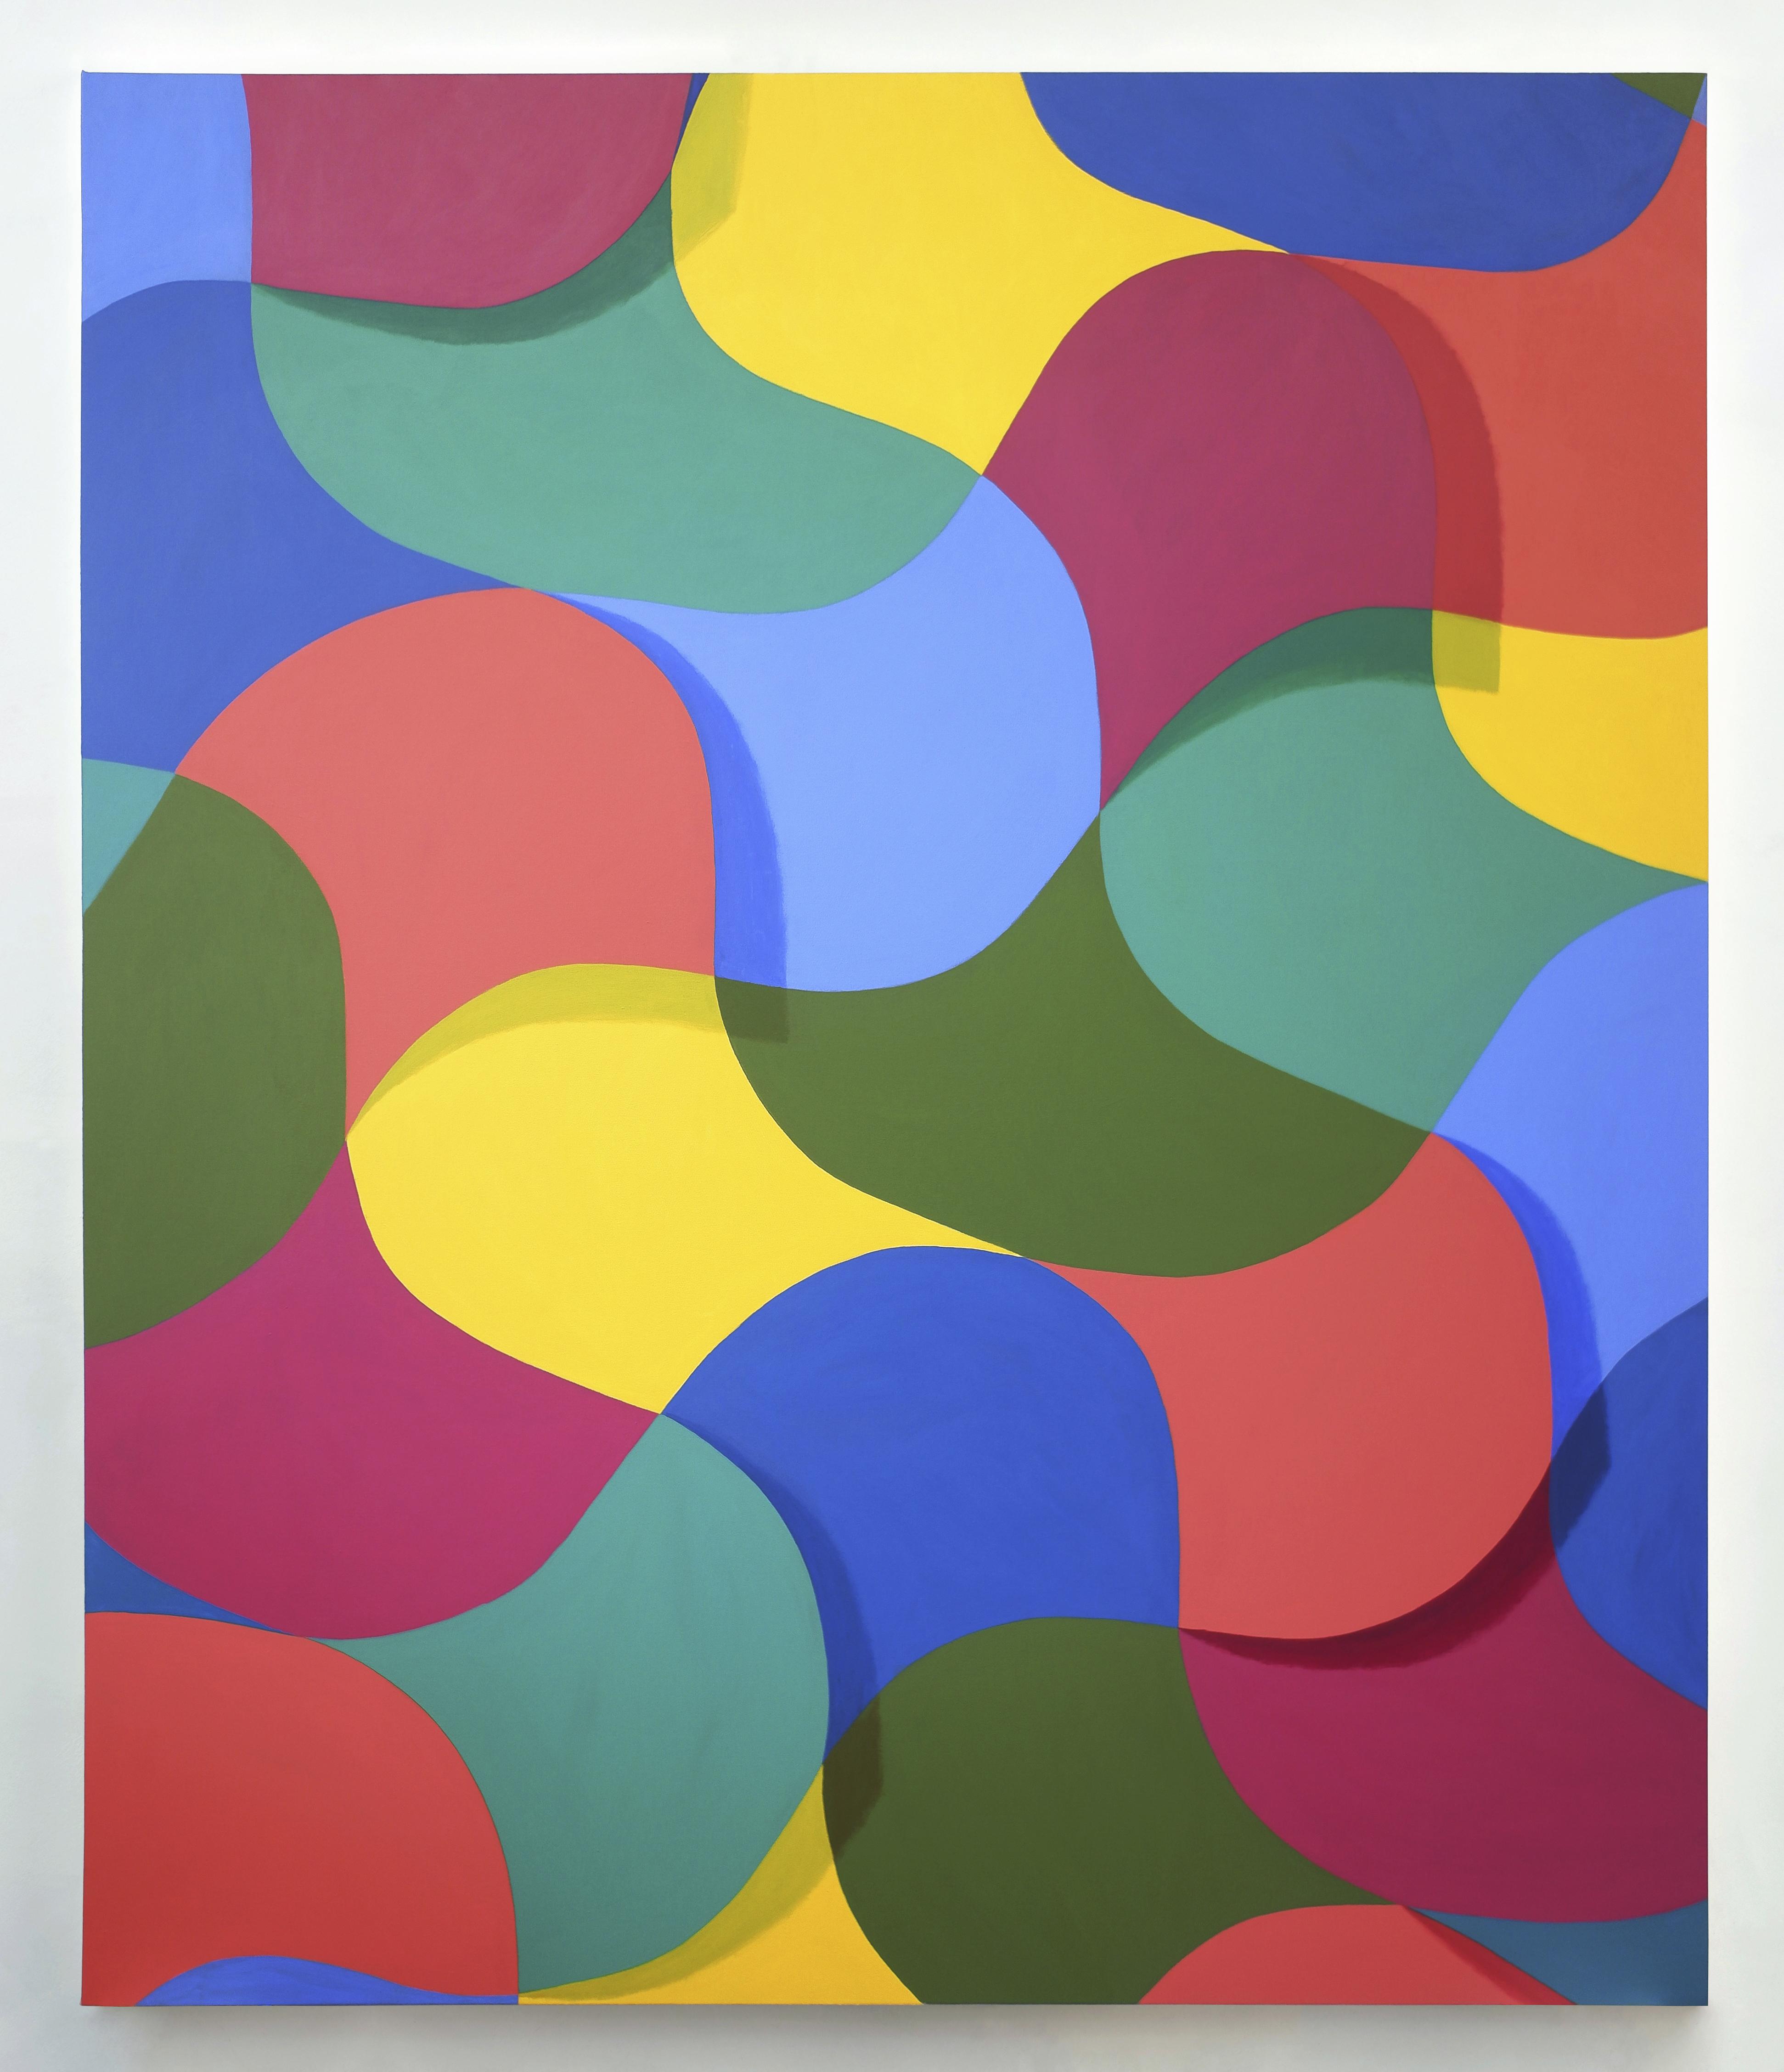 Corydon Cowansage, Waves 1, 2020, acrylic on canvas, 84 x 70 inches